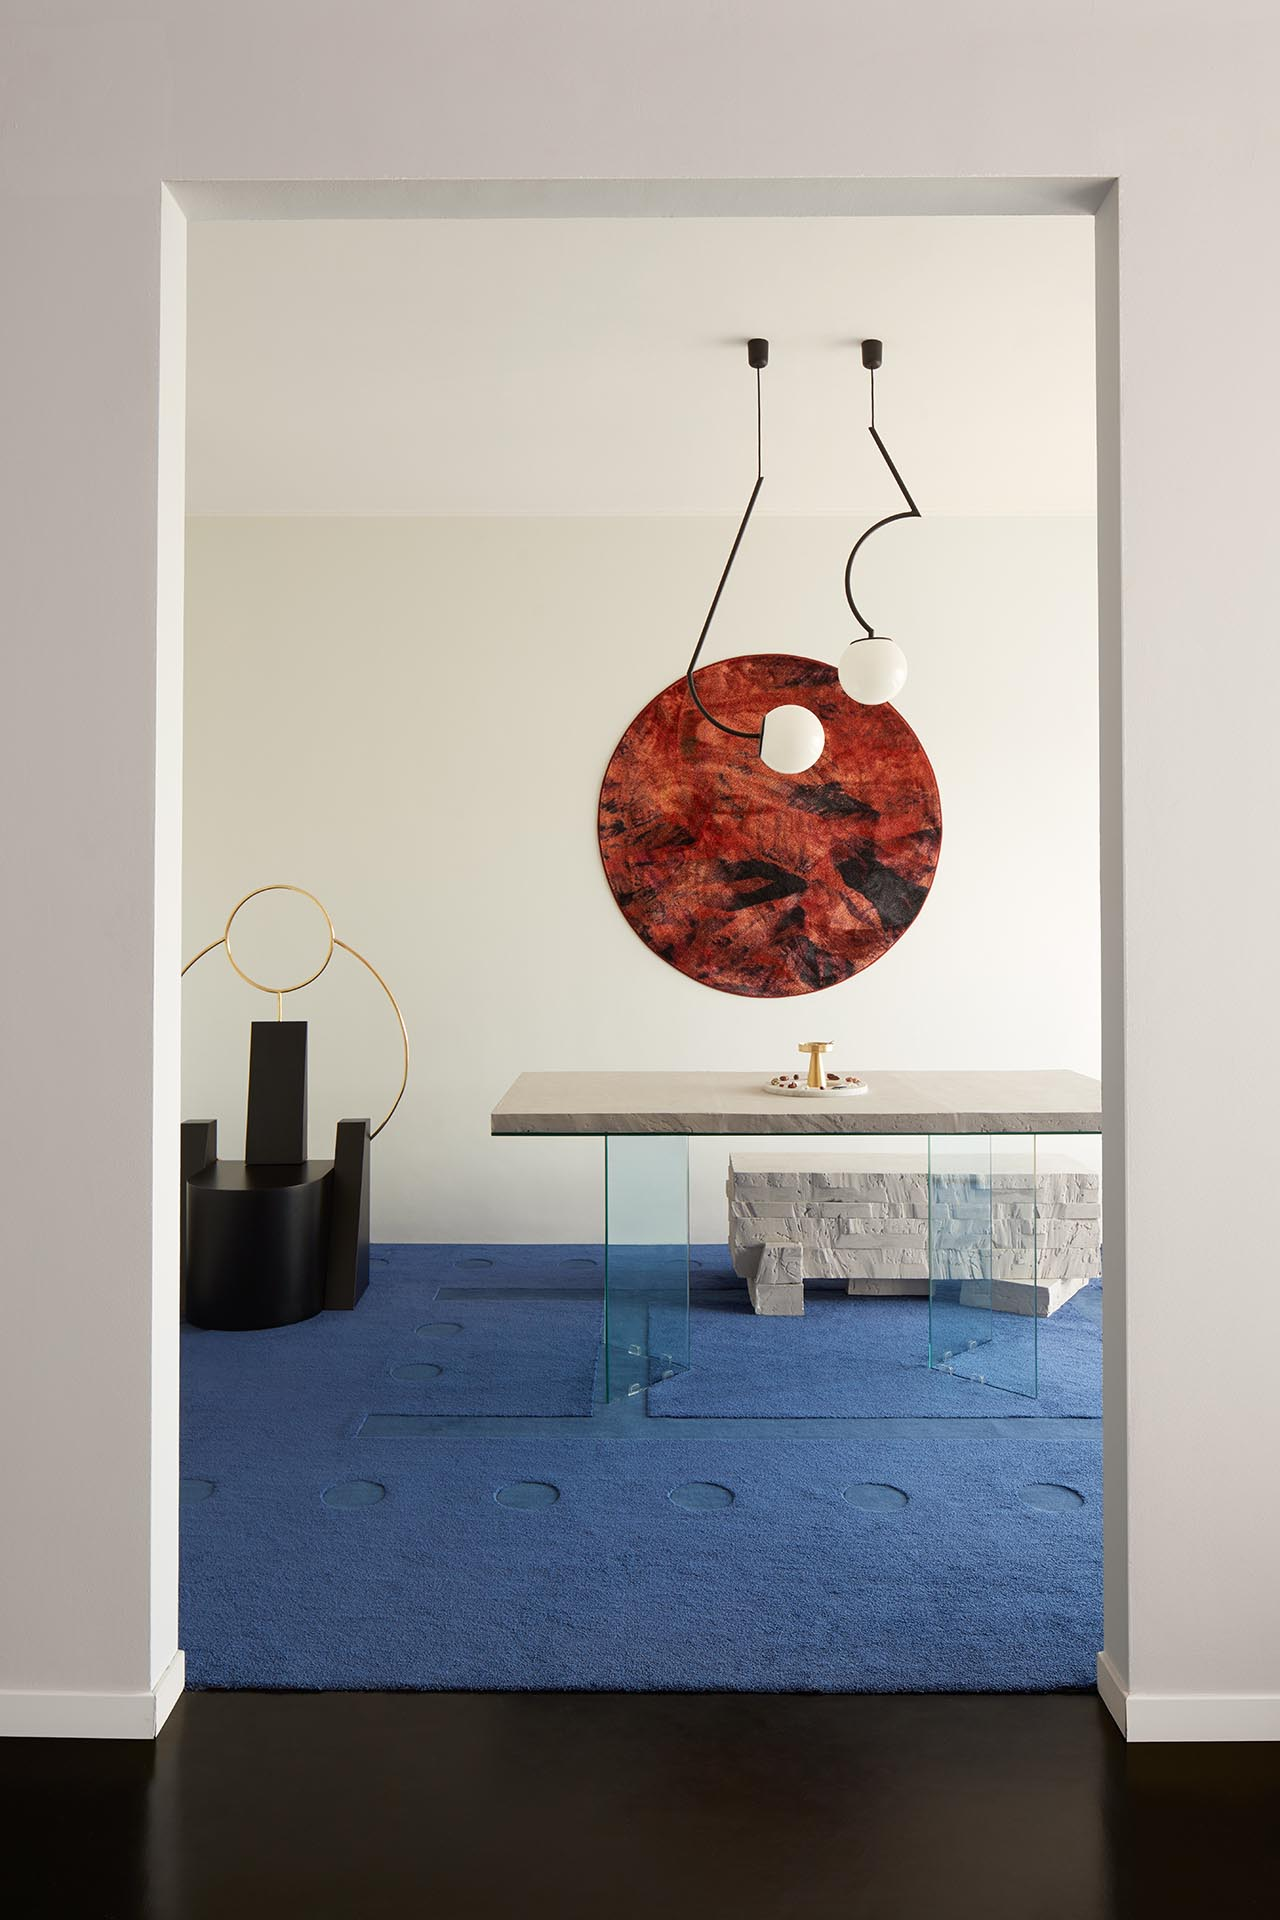 The Symbolic Room